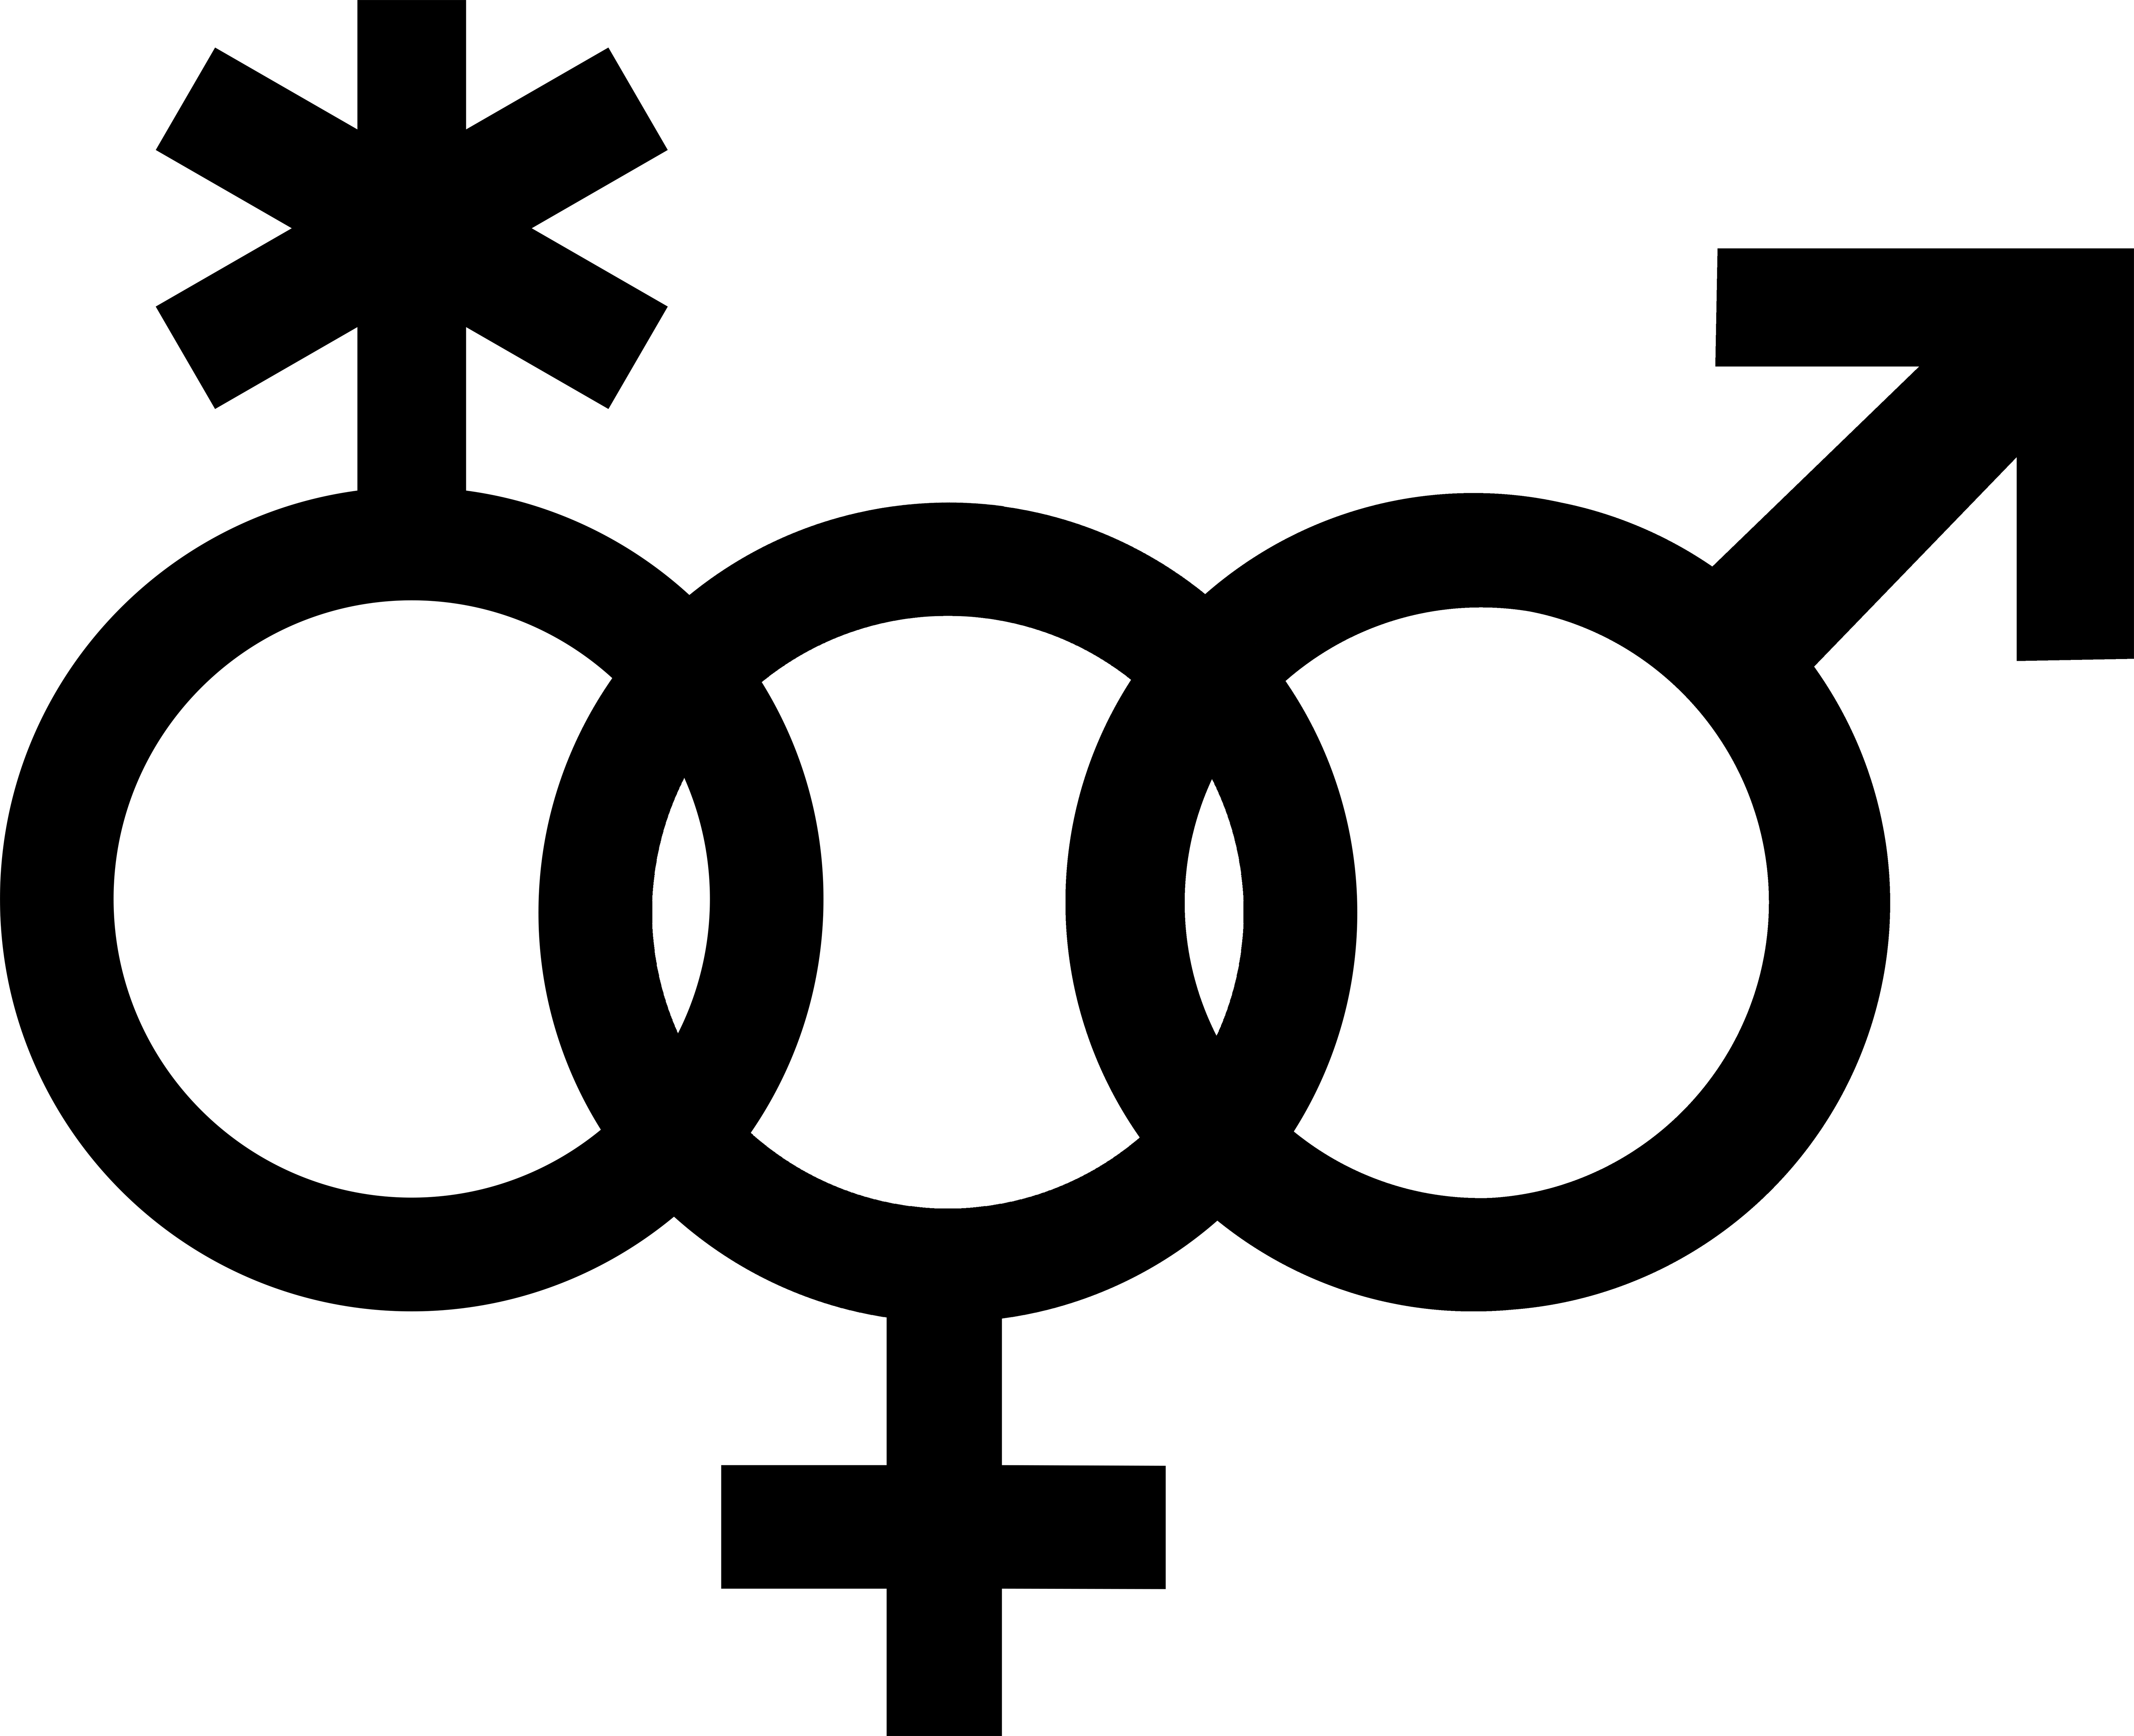 Venus symbol interlocked with a nonbinary symbol and a Mars symbol.